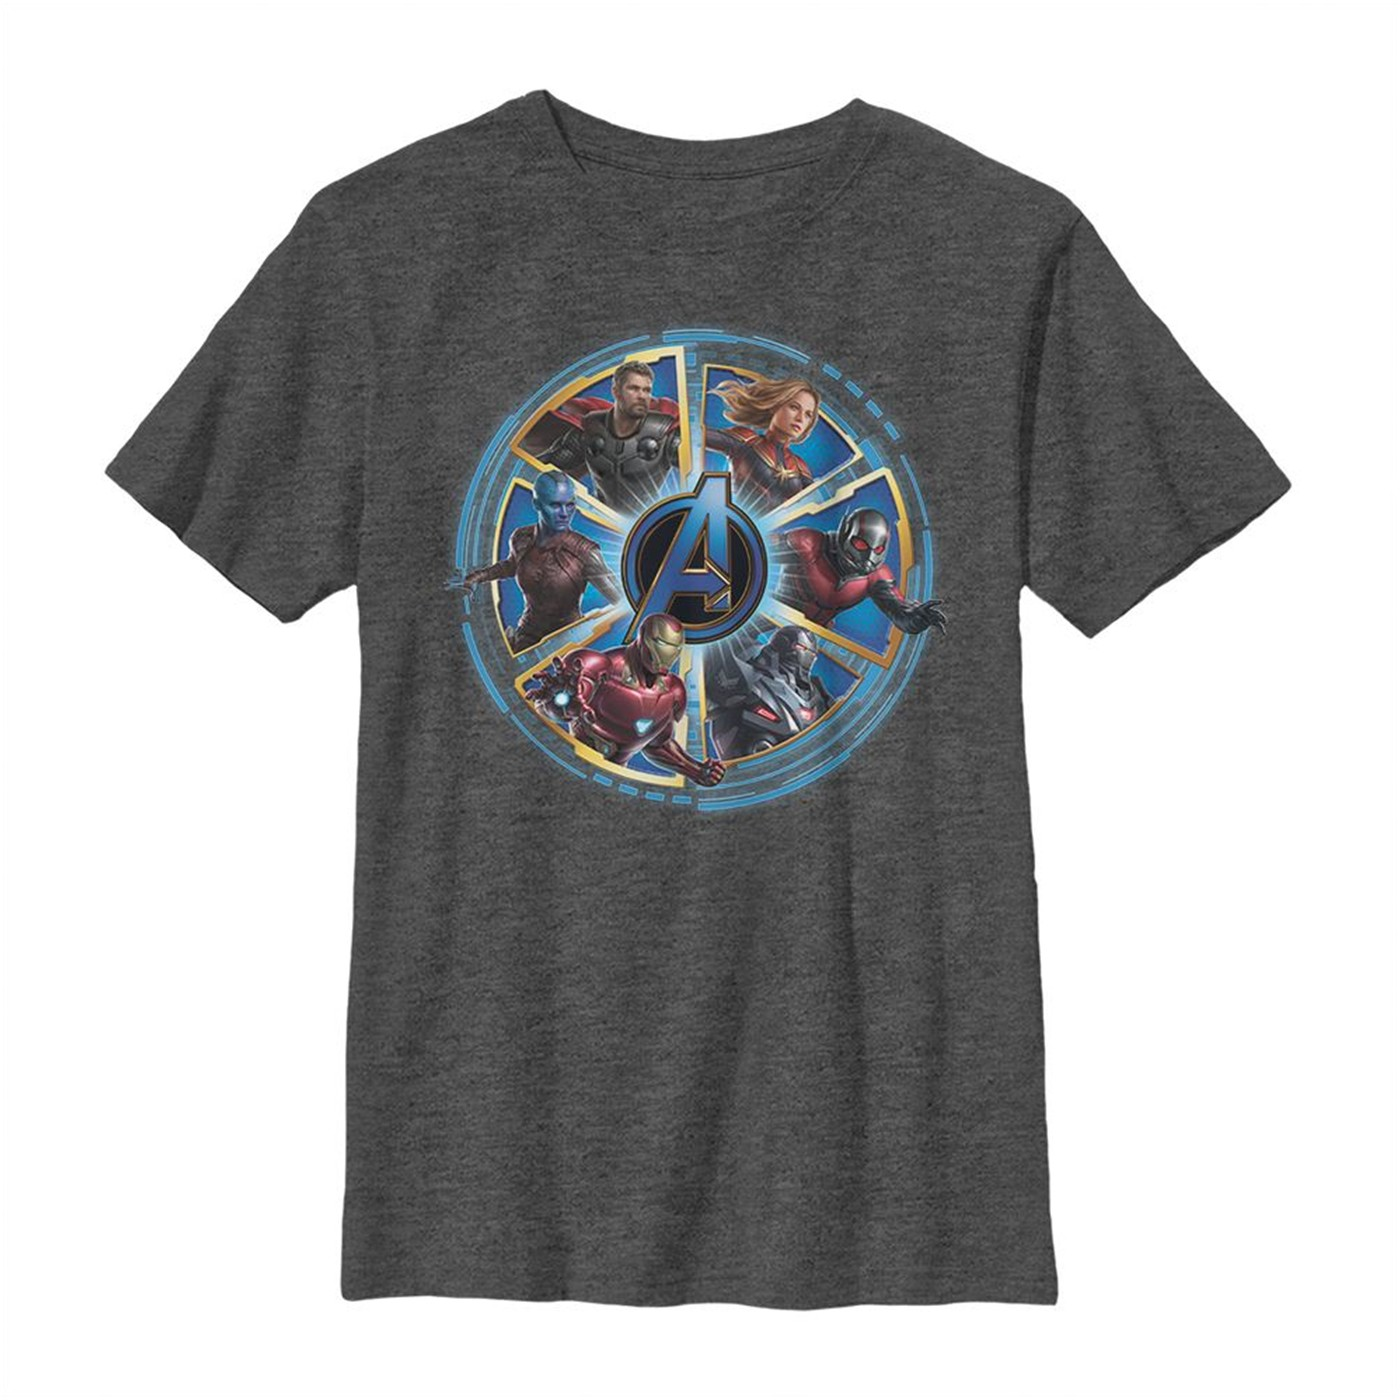 Avengers Endgame Heroes Circle Youth T-Shirt